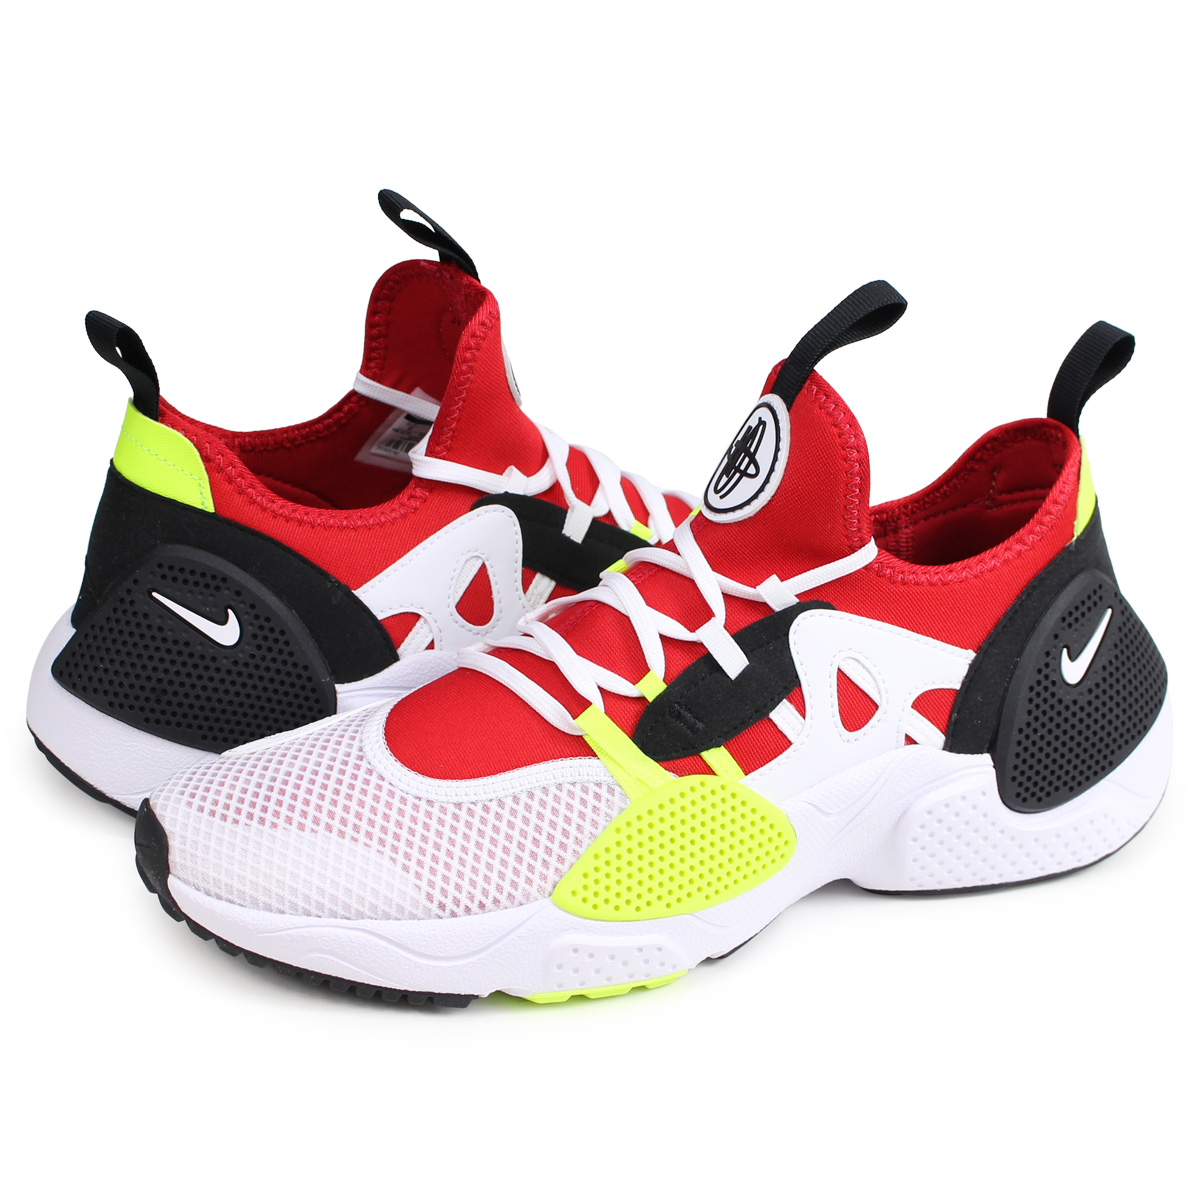 6af27ec00ef5 Nike NIKE エアハラチスニーカーメンズ AIR HUARACHE NIKE HUARACHE E.D.G.E. TXT red AO1697- 100  load planned Shinnyu load in reservation product 2 14 ...